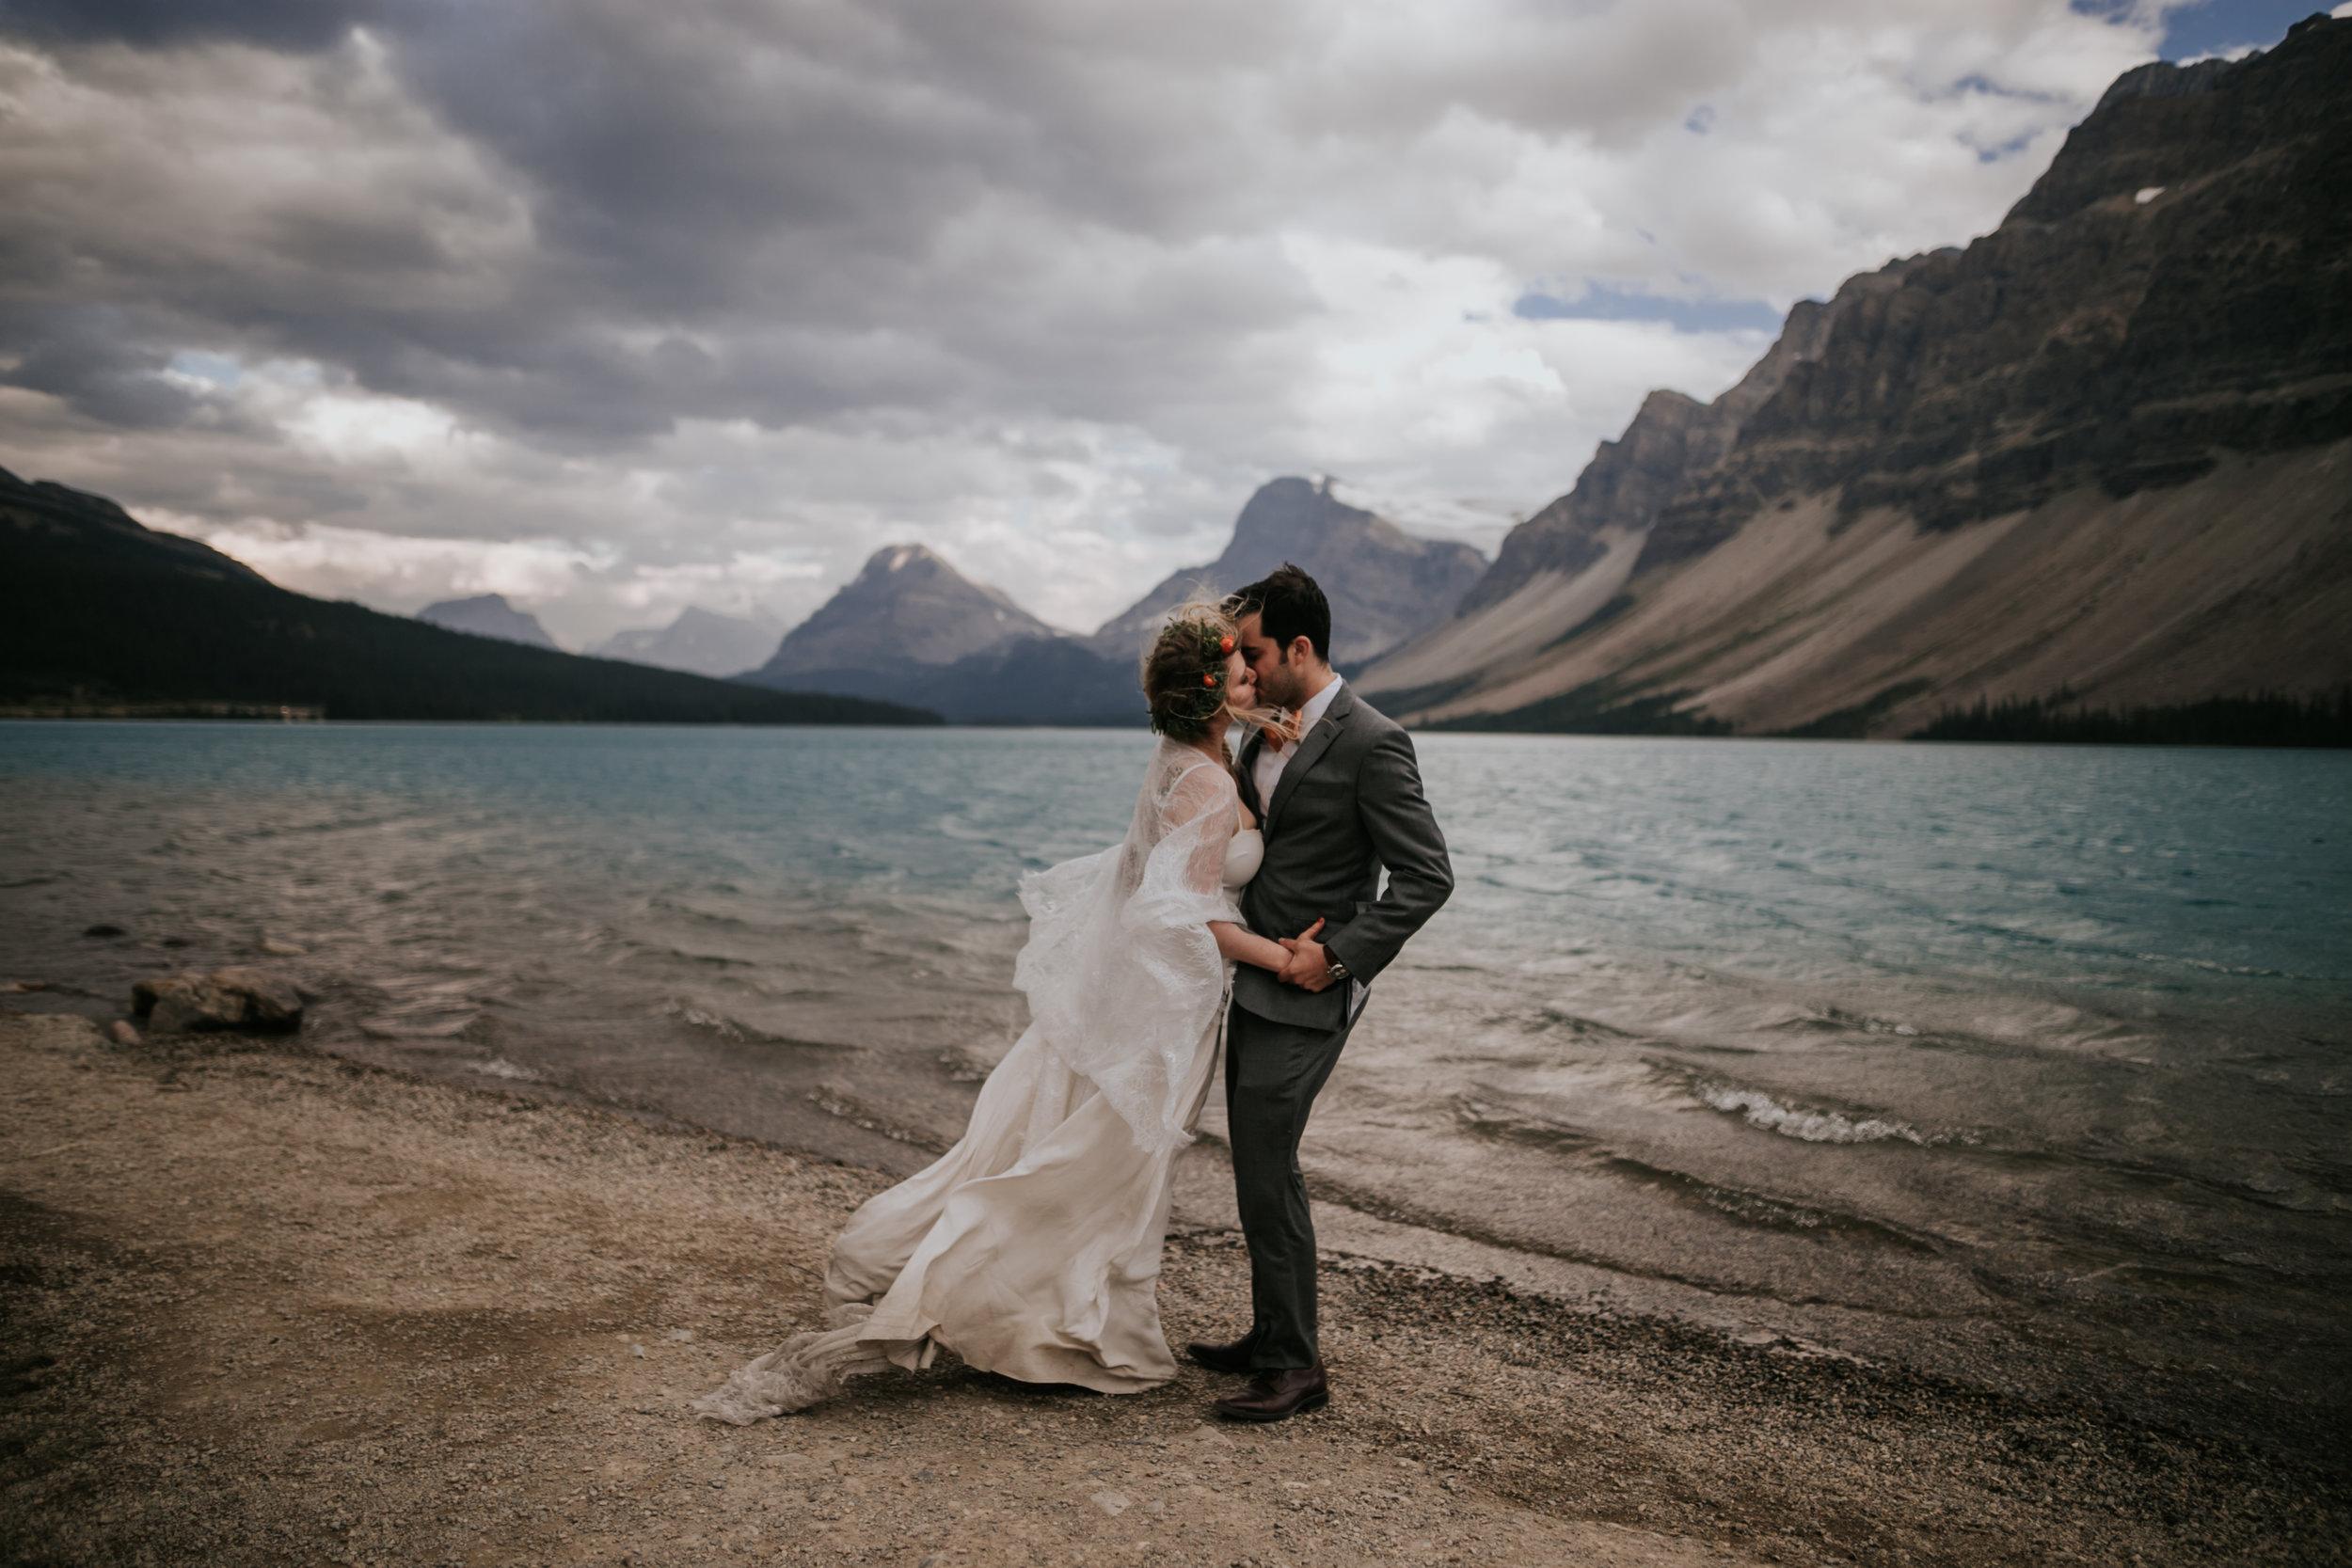 Raphaela and Demming- Banff Elopement  - The Soft Season